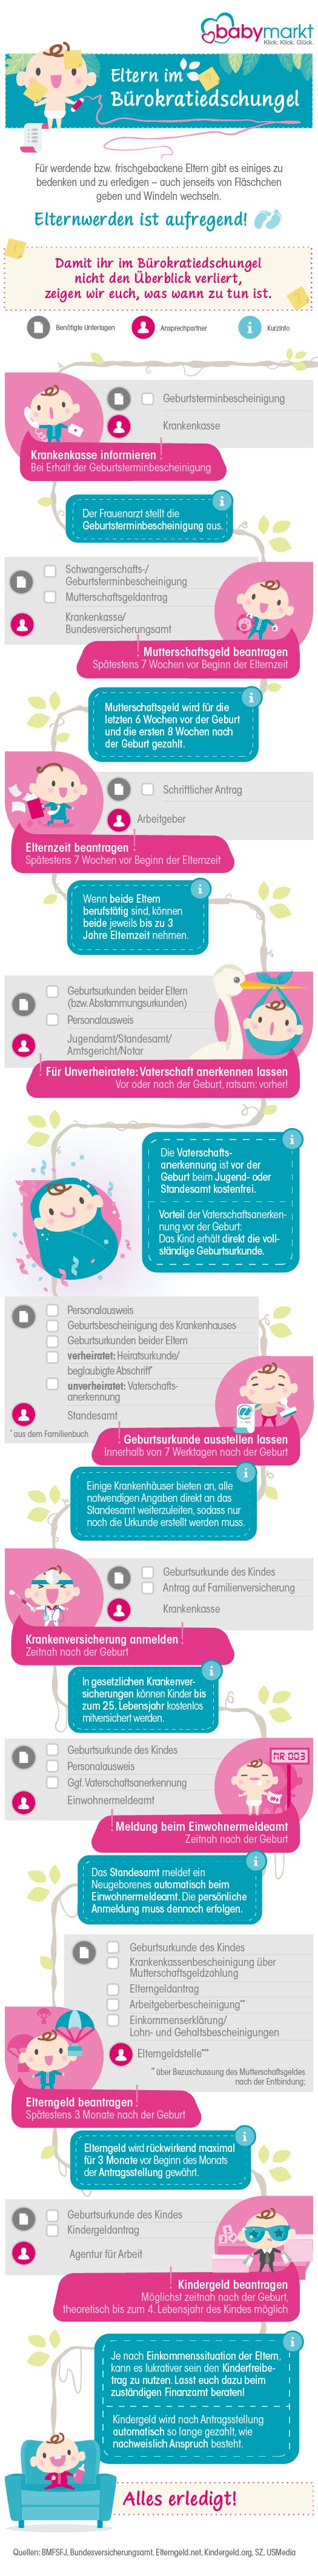 infografik_buerokratiedschungel_babymarkt